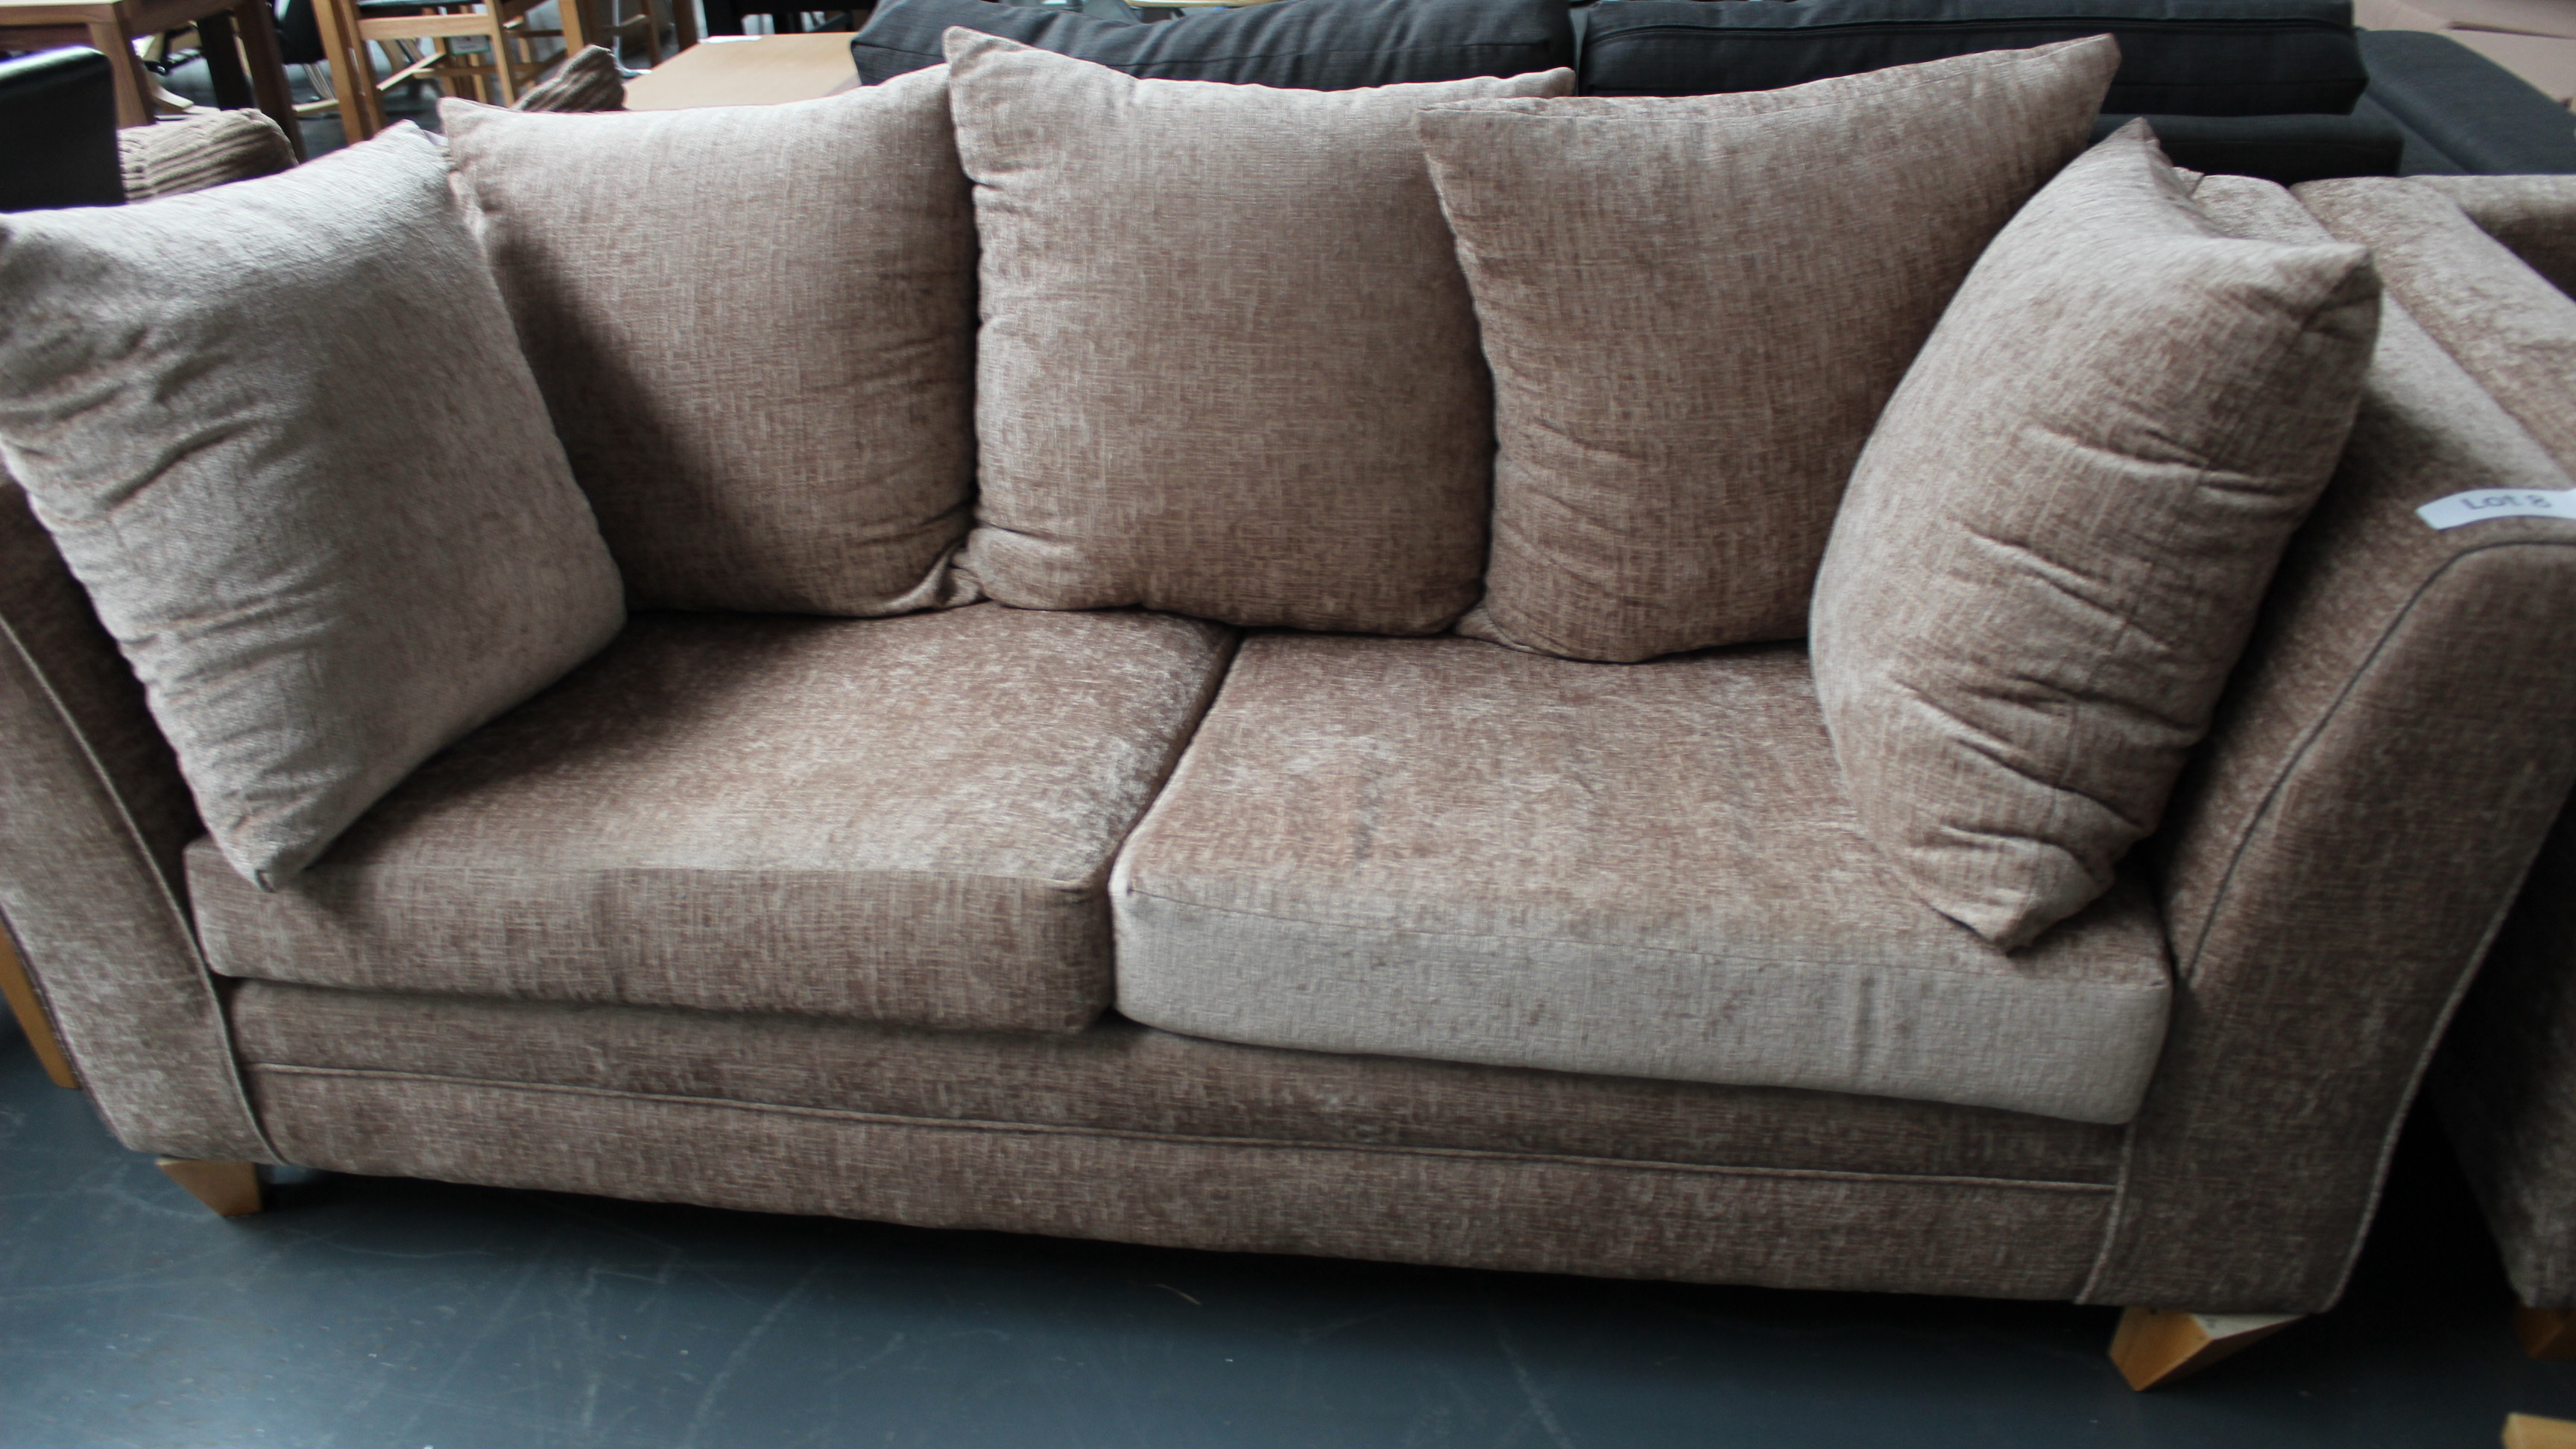 Lot 8 - 3 Seater Mink Sofa Customer Returns